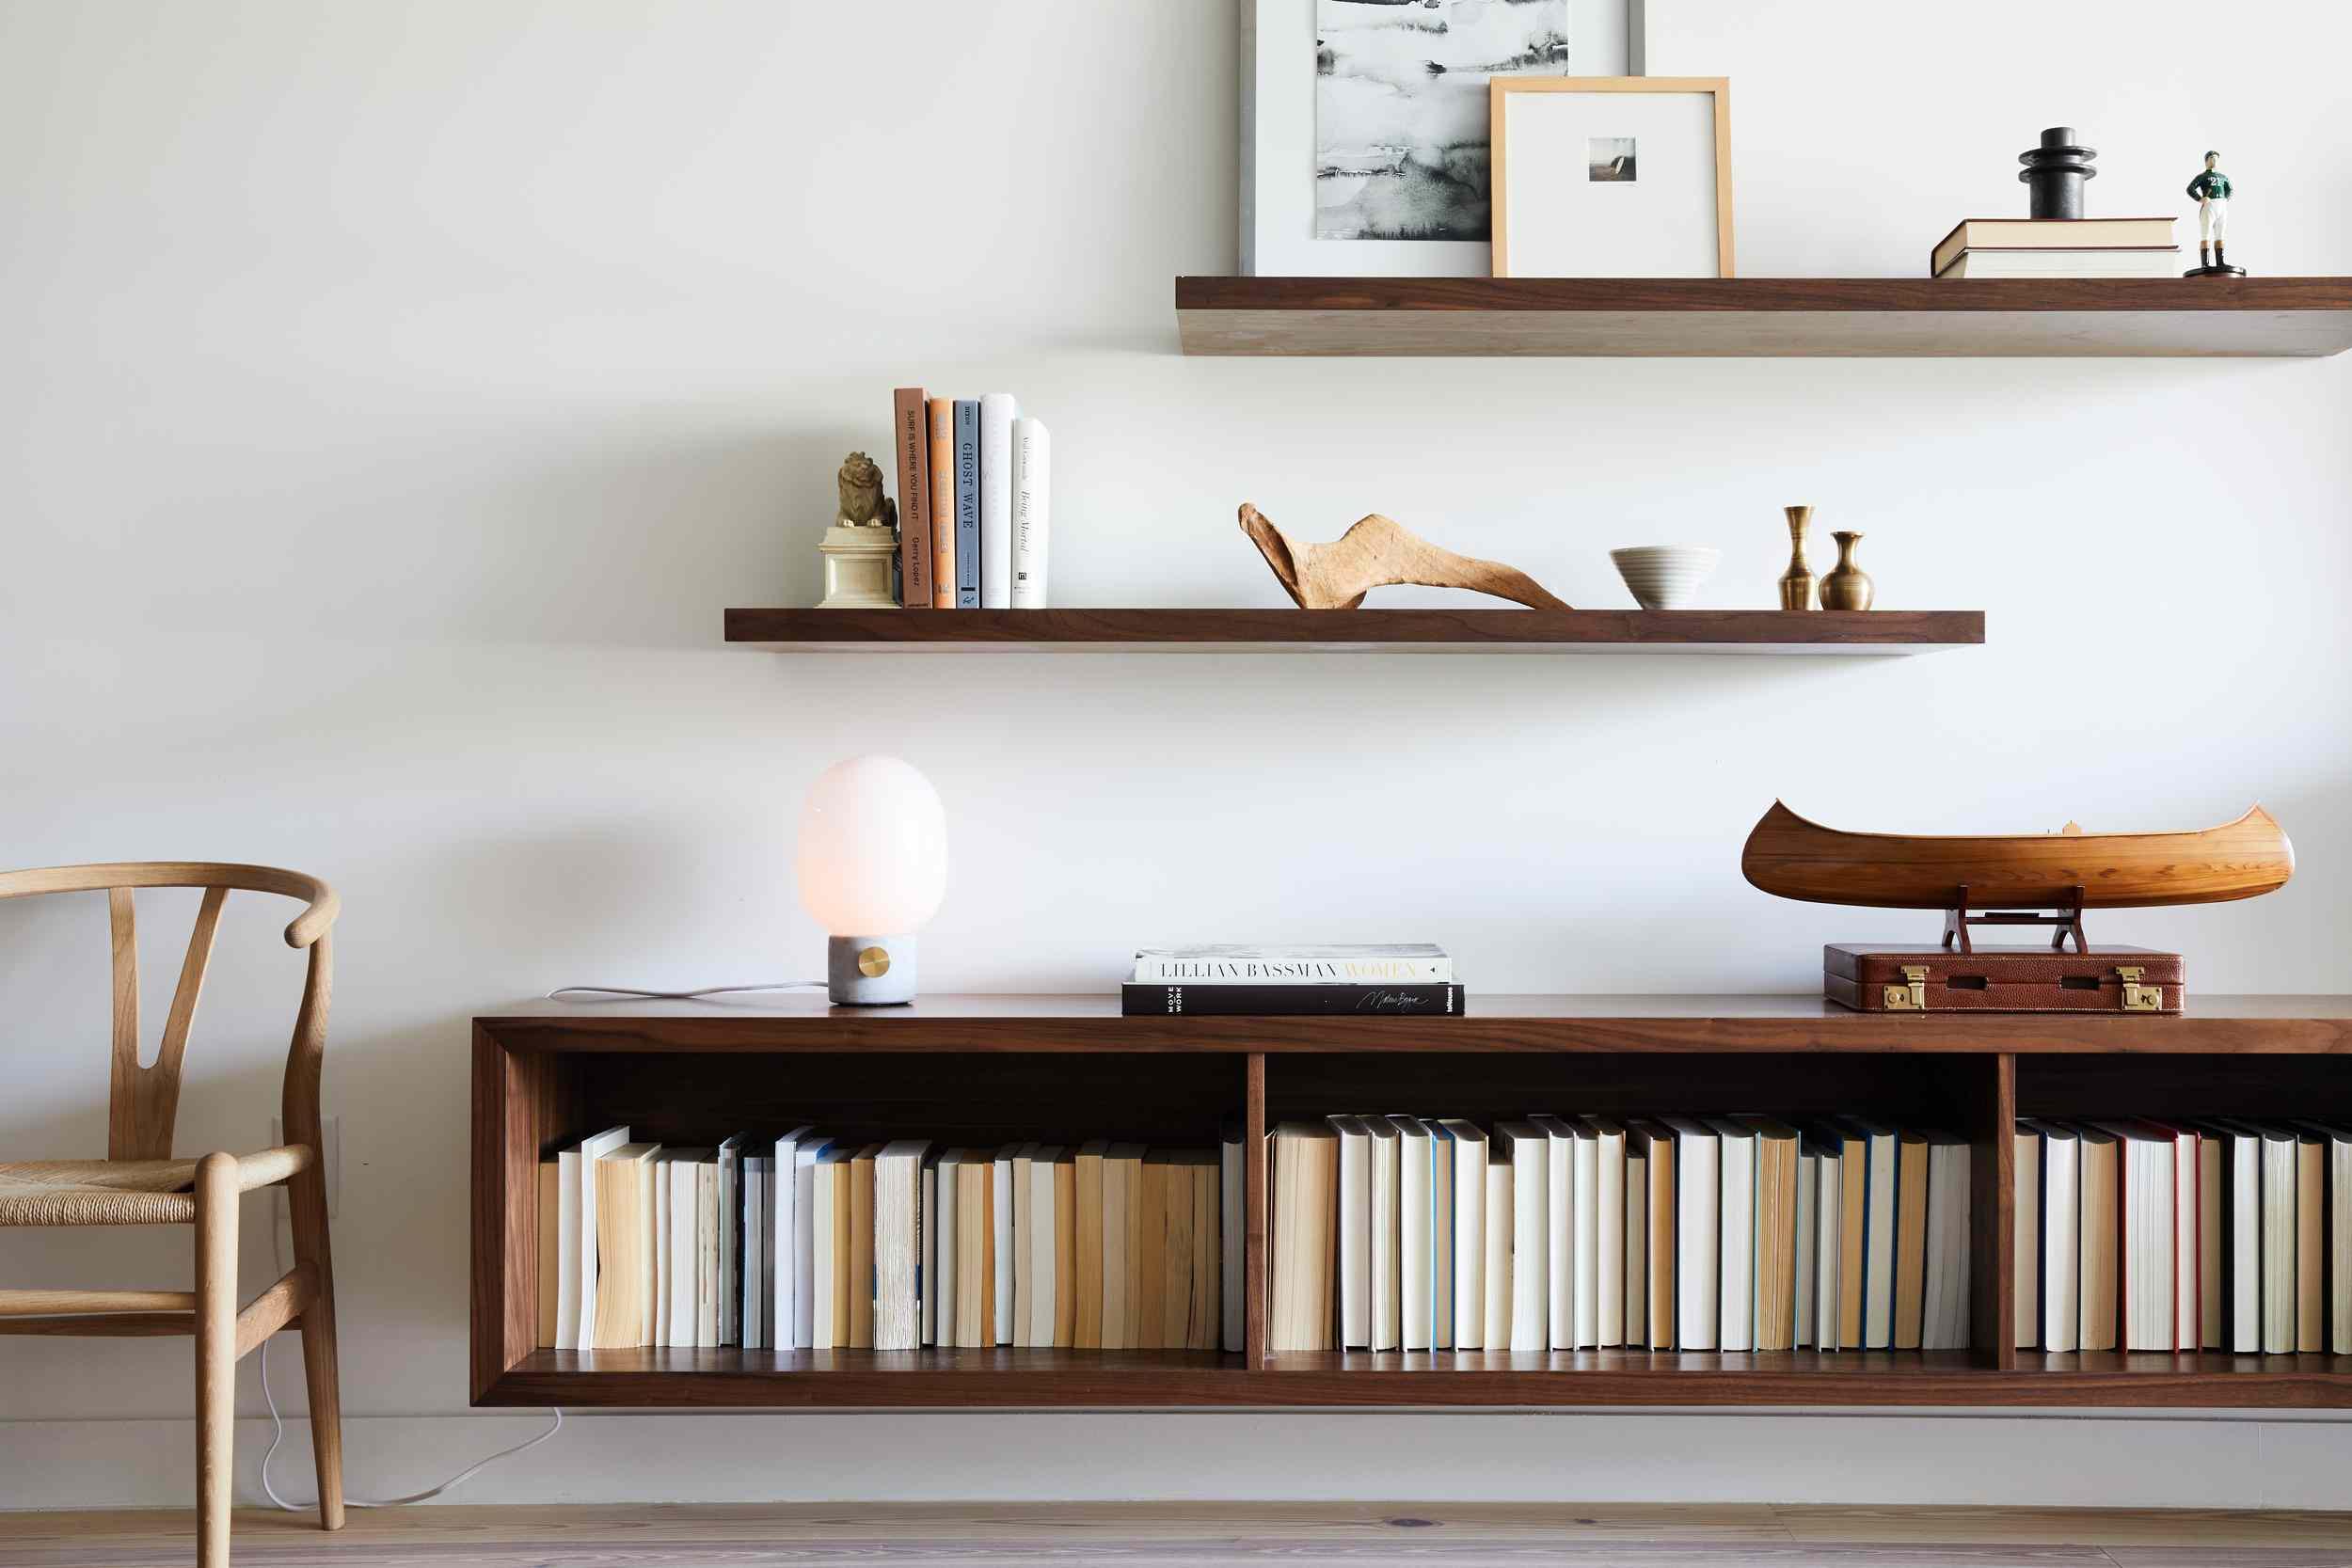 Styled floating shelves